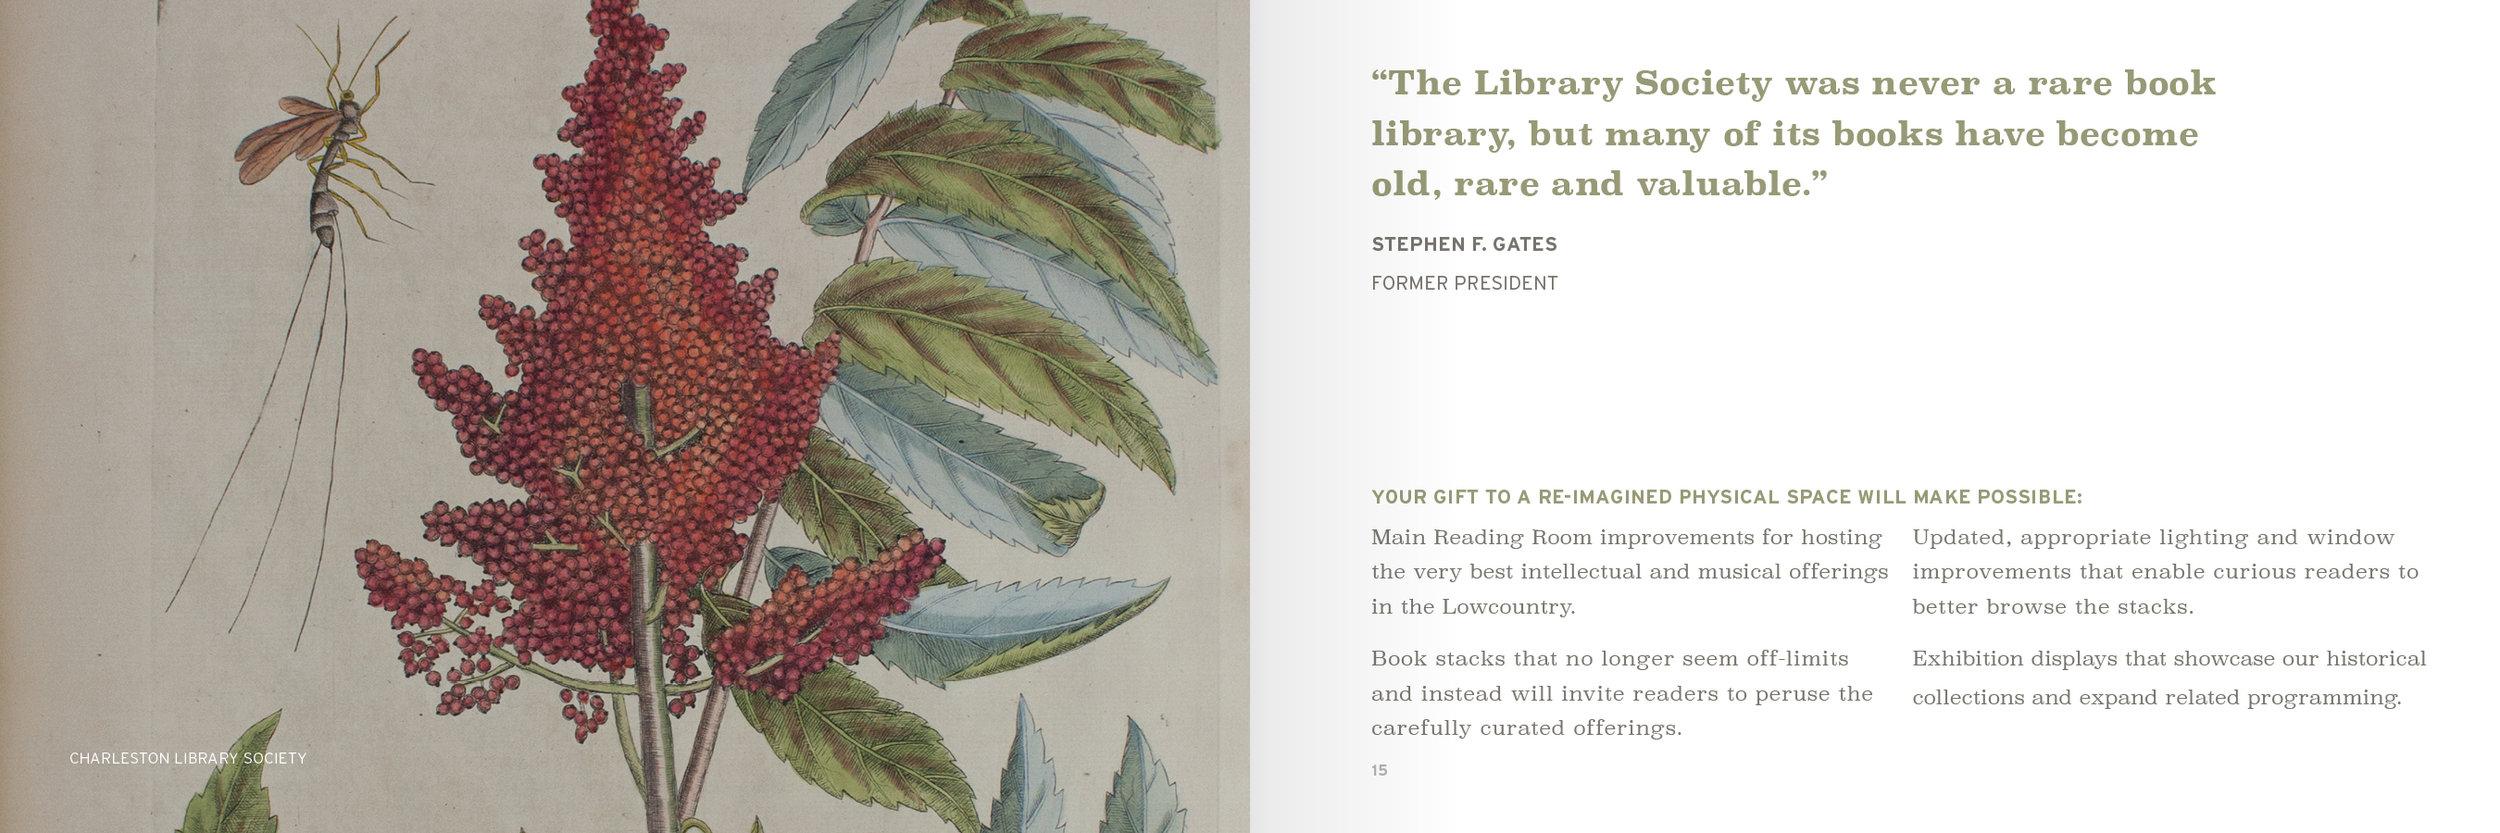 1703023 - Library Society REV8.jpg